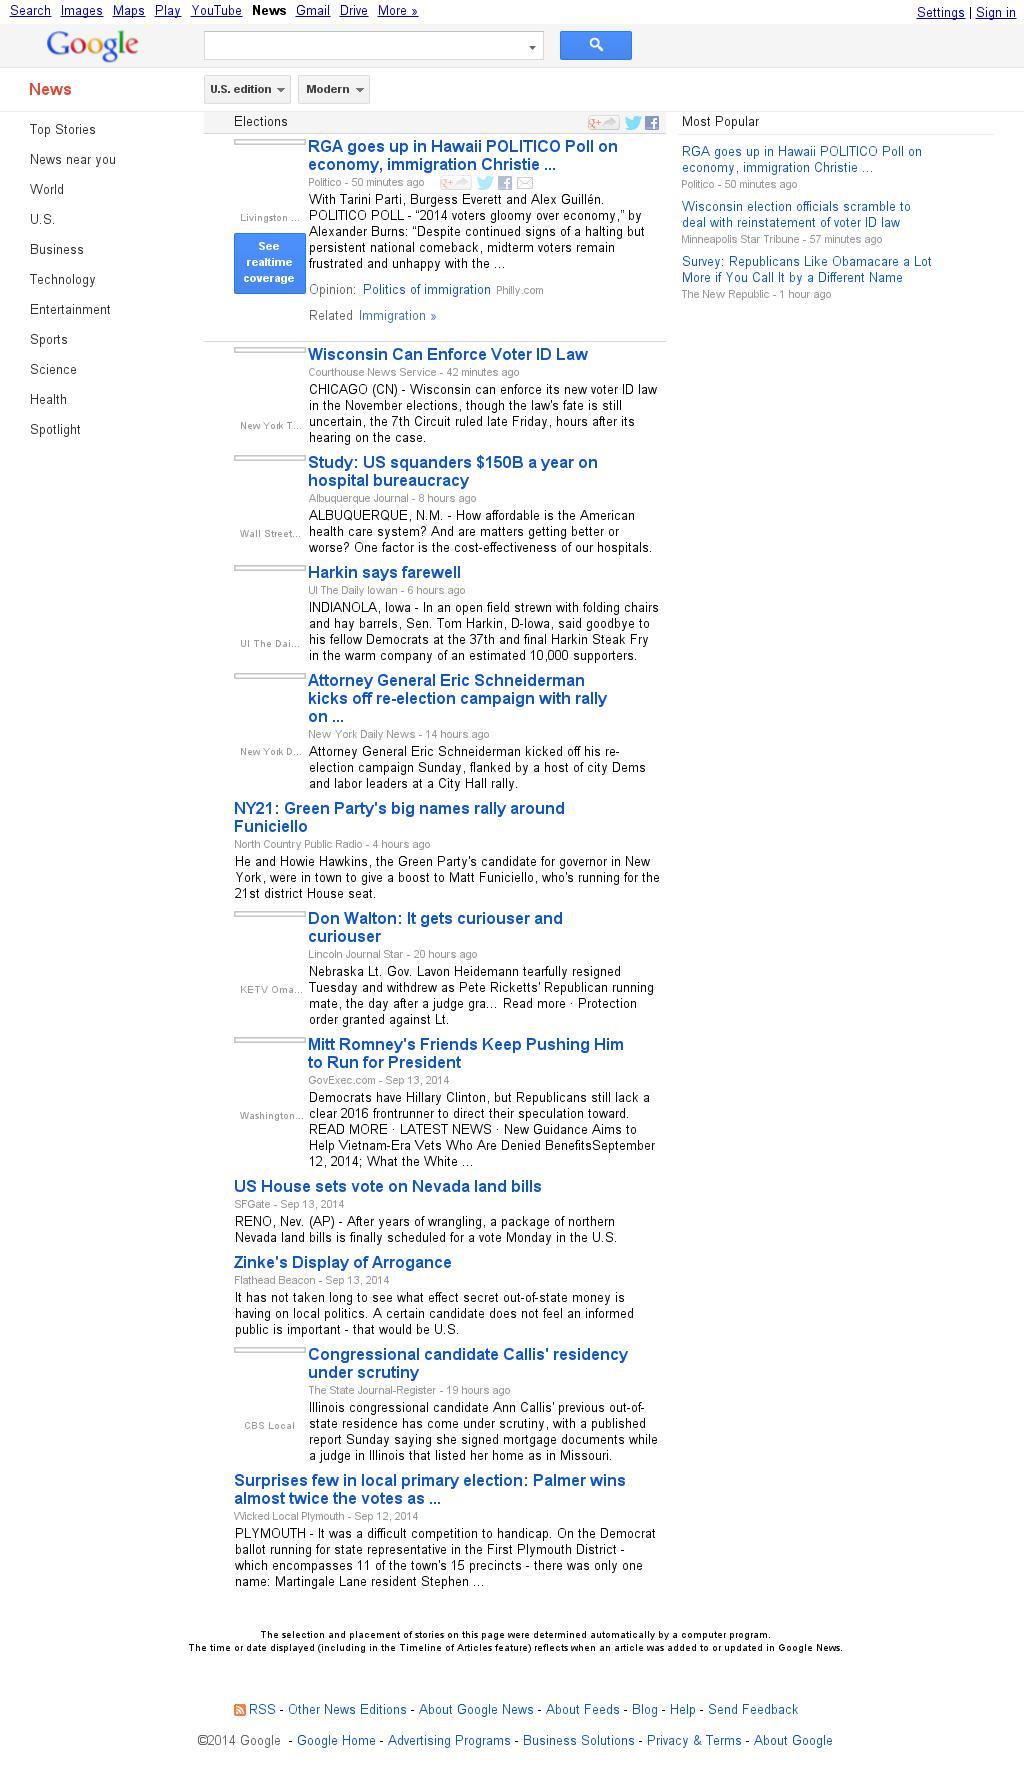 Google News: Elections at Monday Sept. 15, 2014, 3:08 p.m. UTC